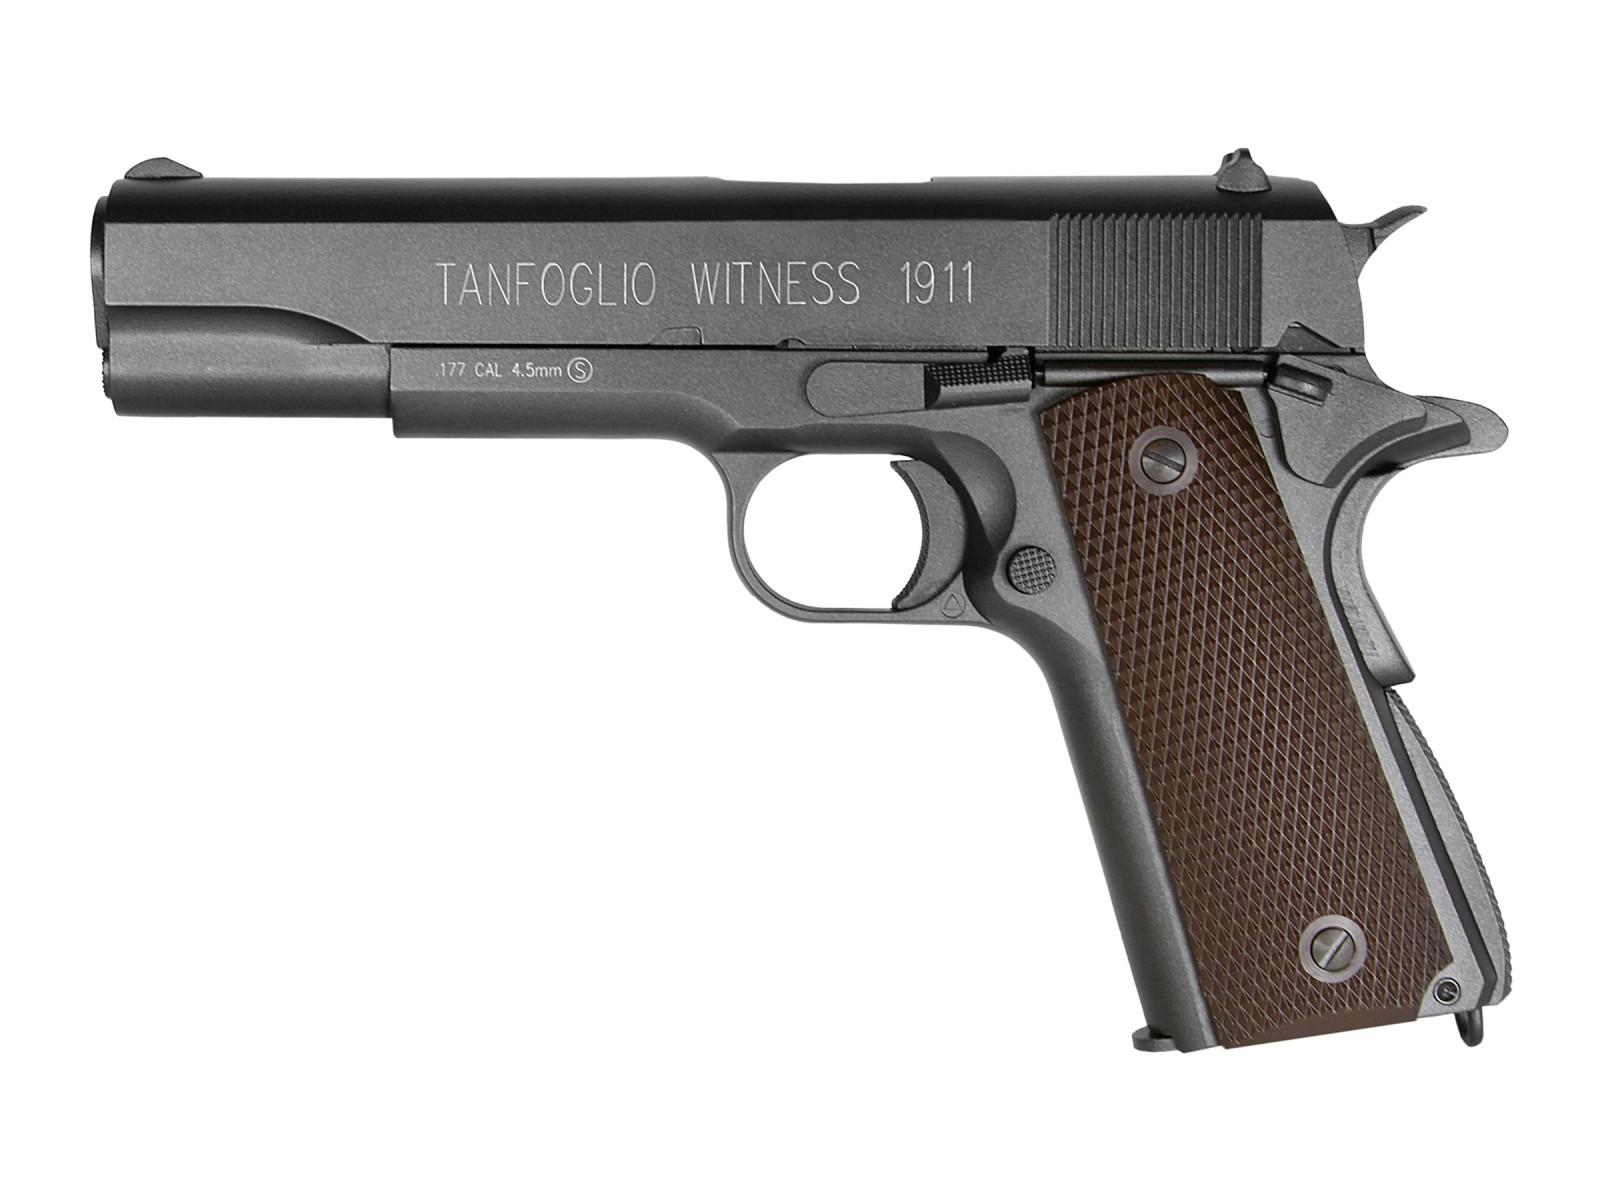 Tanfoglio Witness 1911.